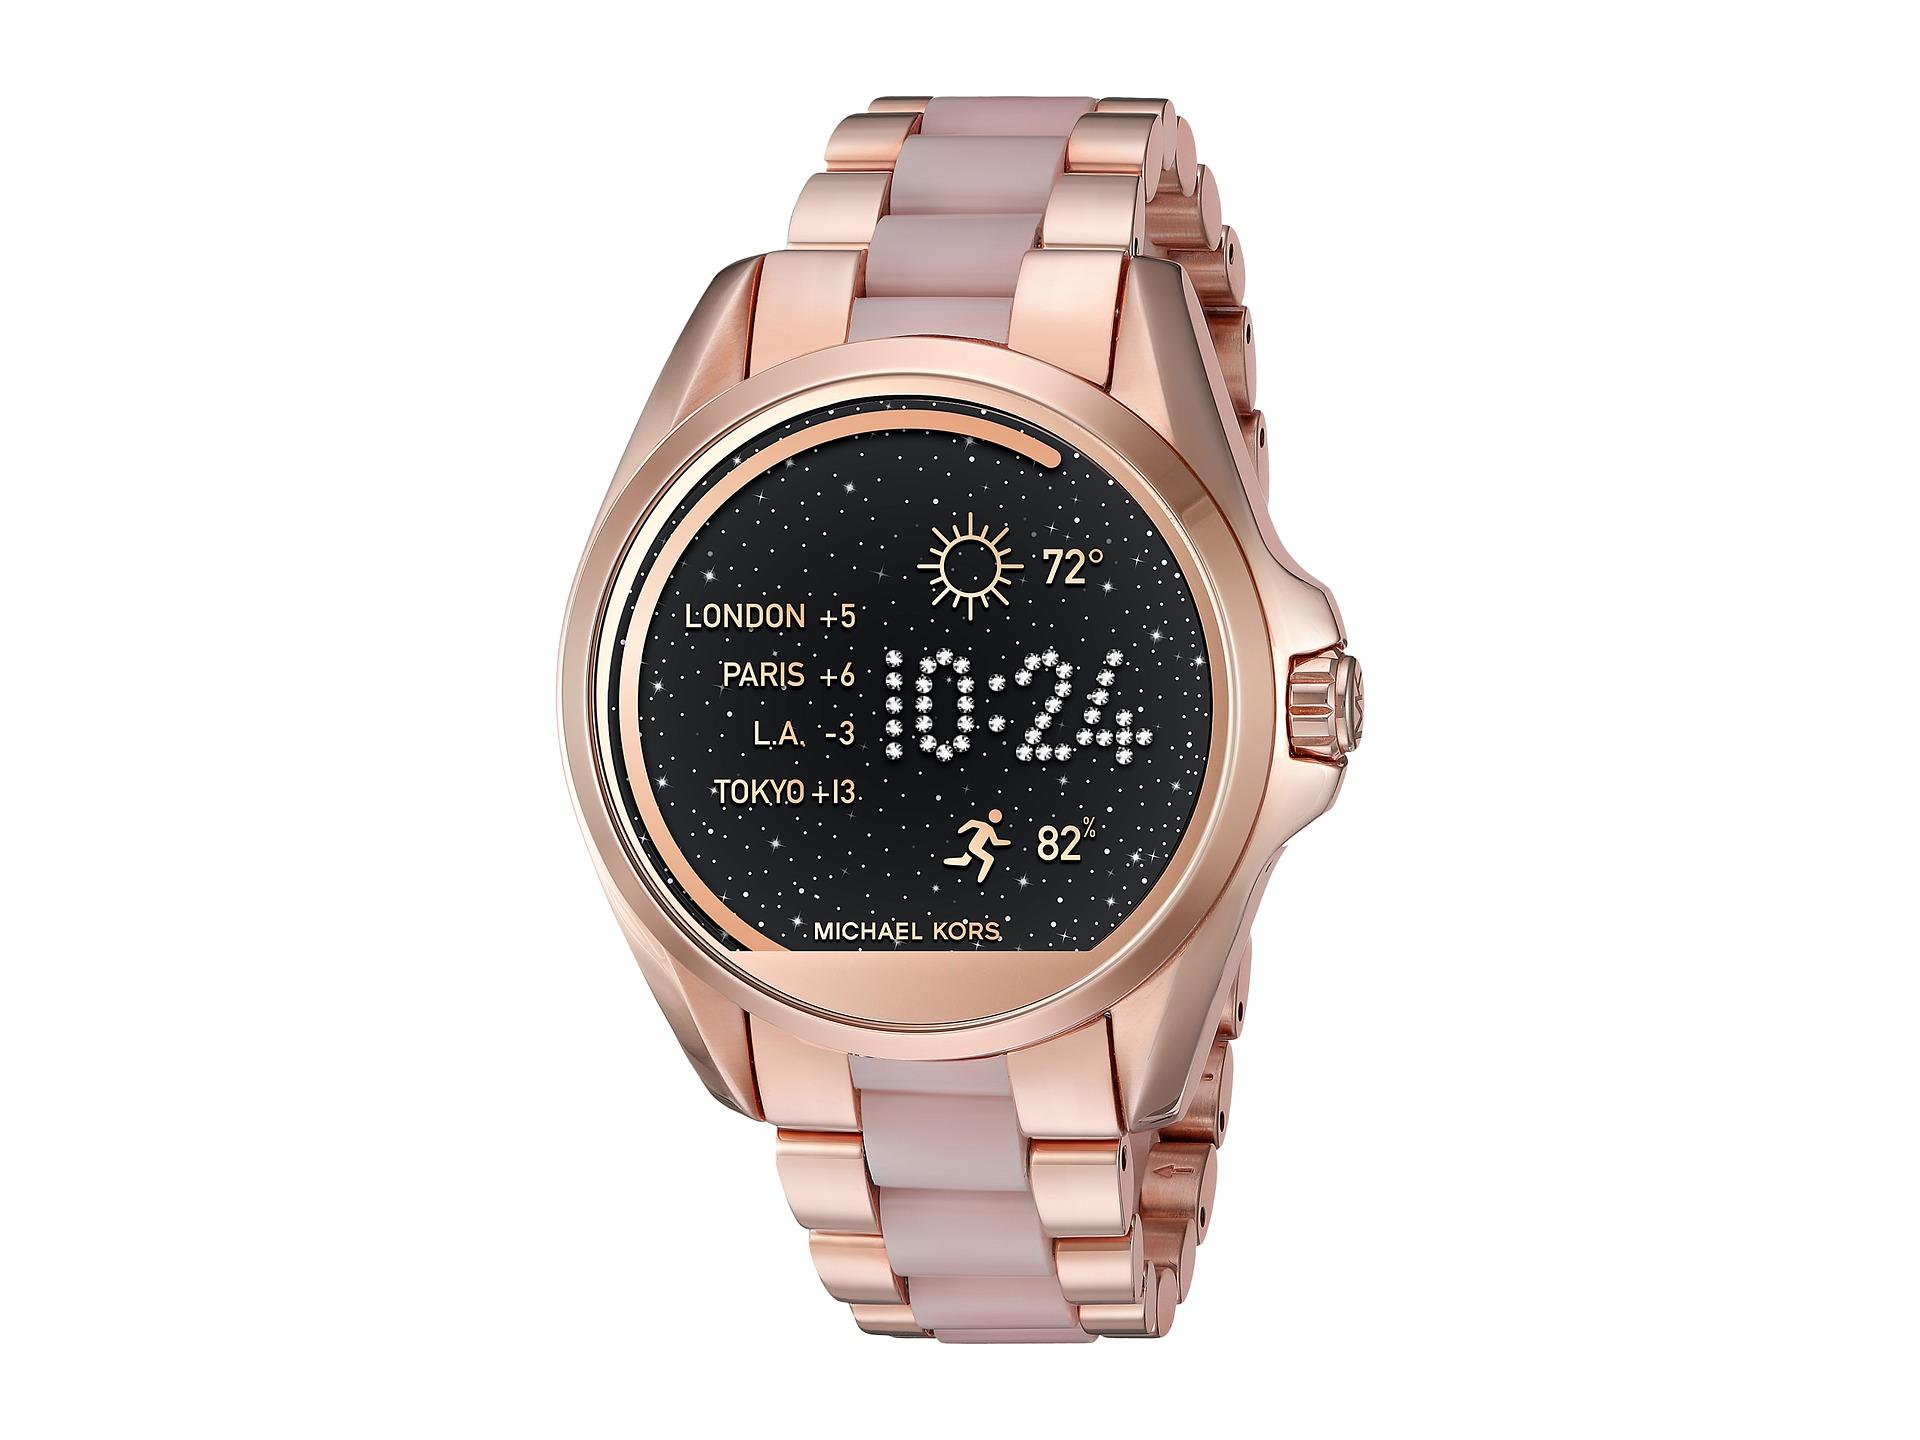 michael kors access bradshaw display smartwatch mkt5013 free shipping both ways. Black Bedroom Furniture Sets. Home Design Ideas